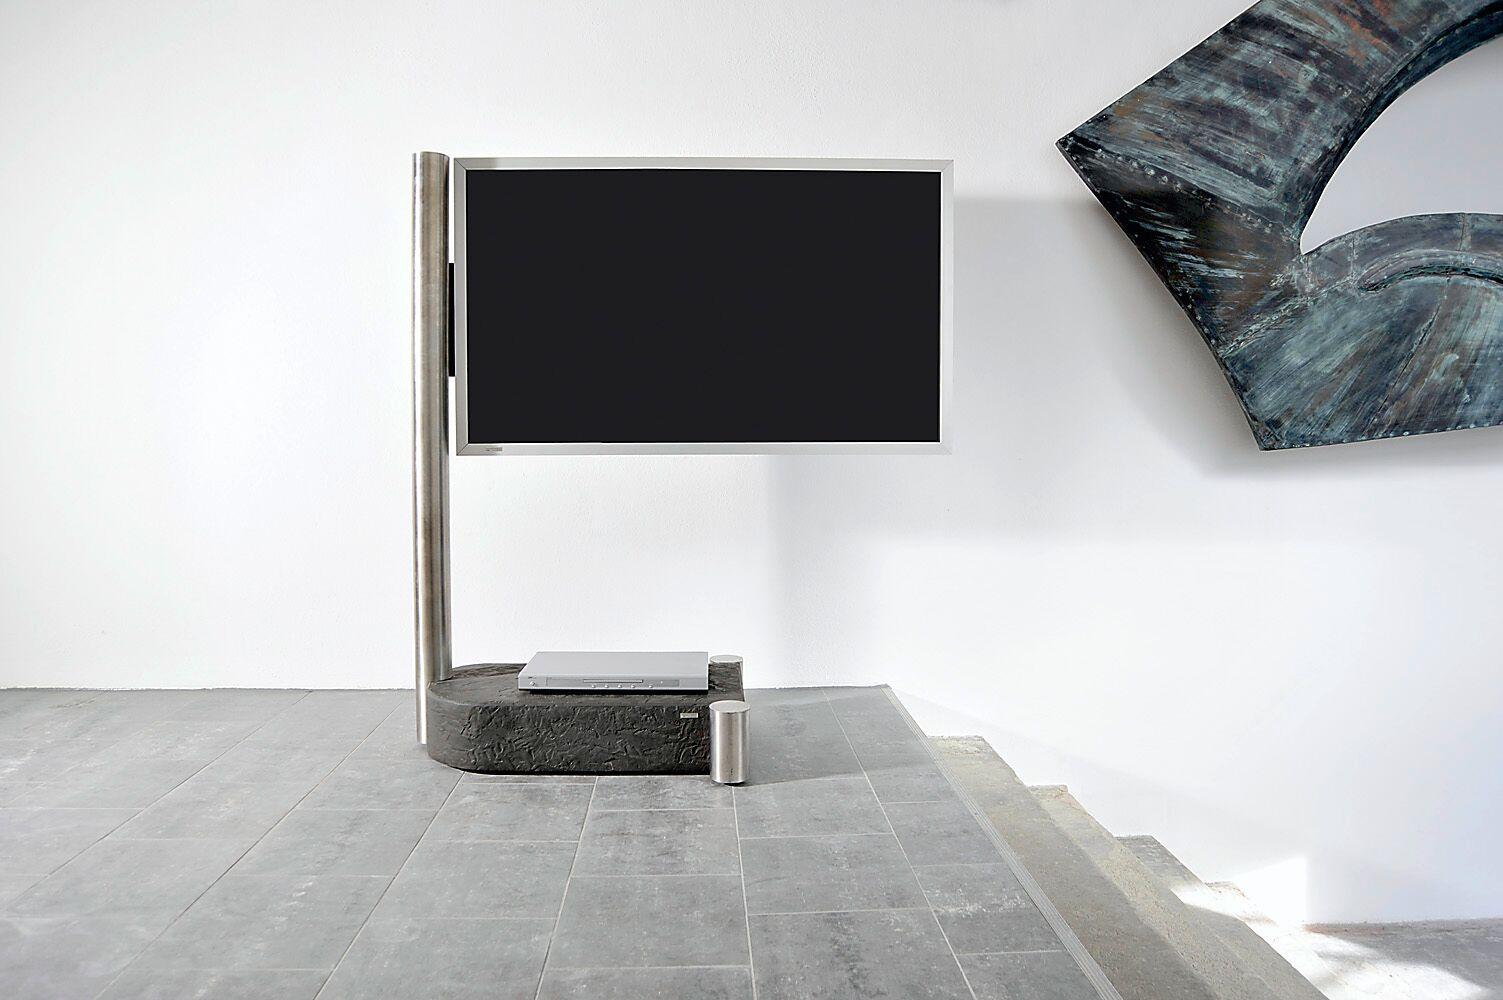 Wissmann Tv Meubel.Tv Holder Inidividual Art110 By Wissmann Raumobjekte Archello